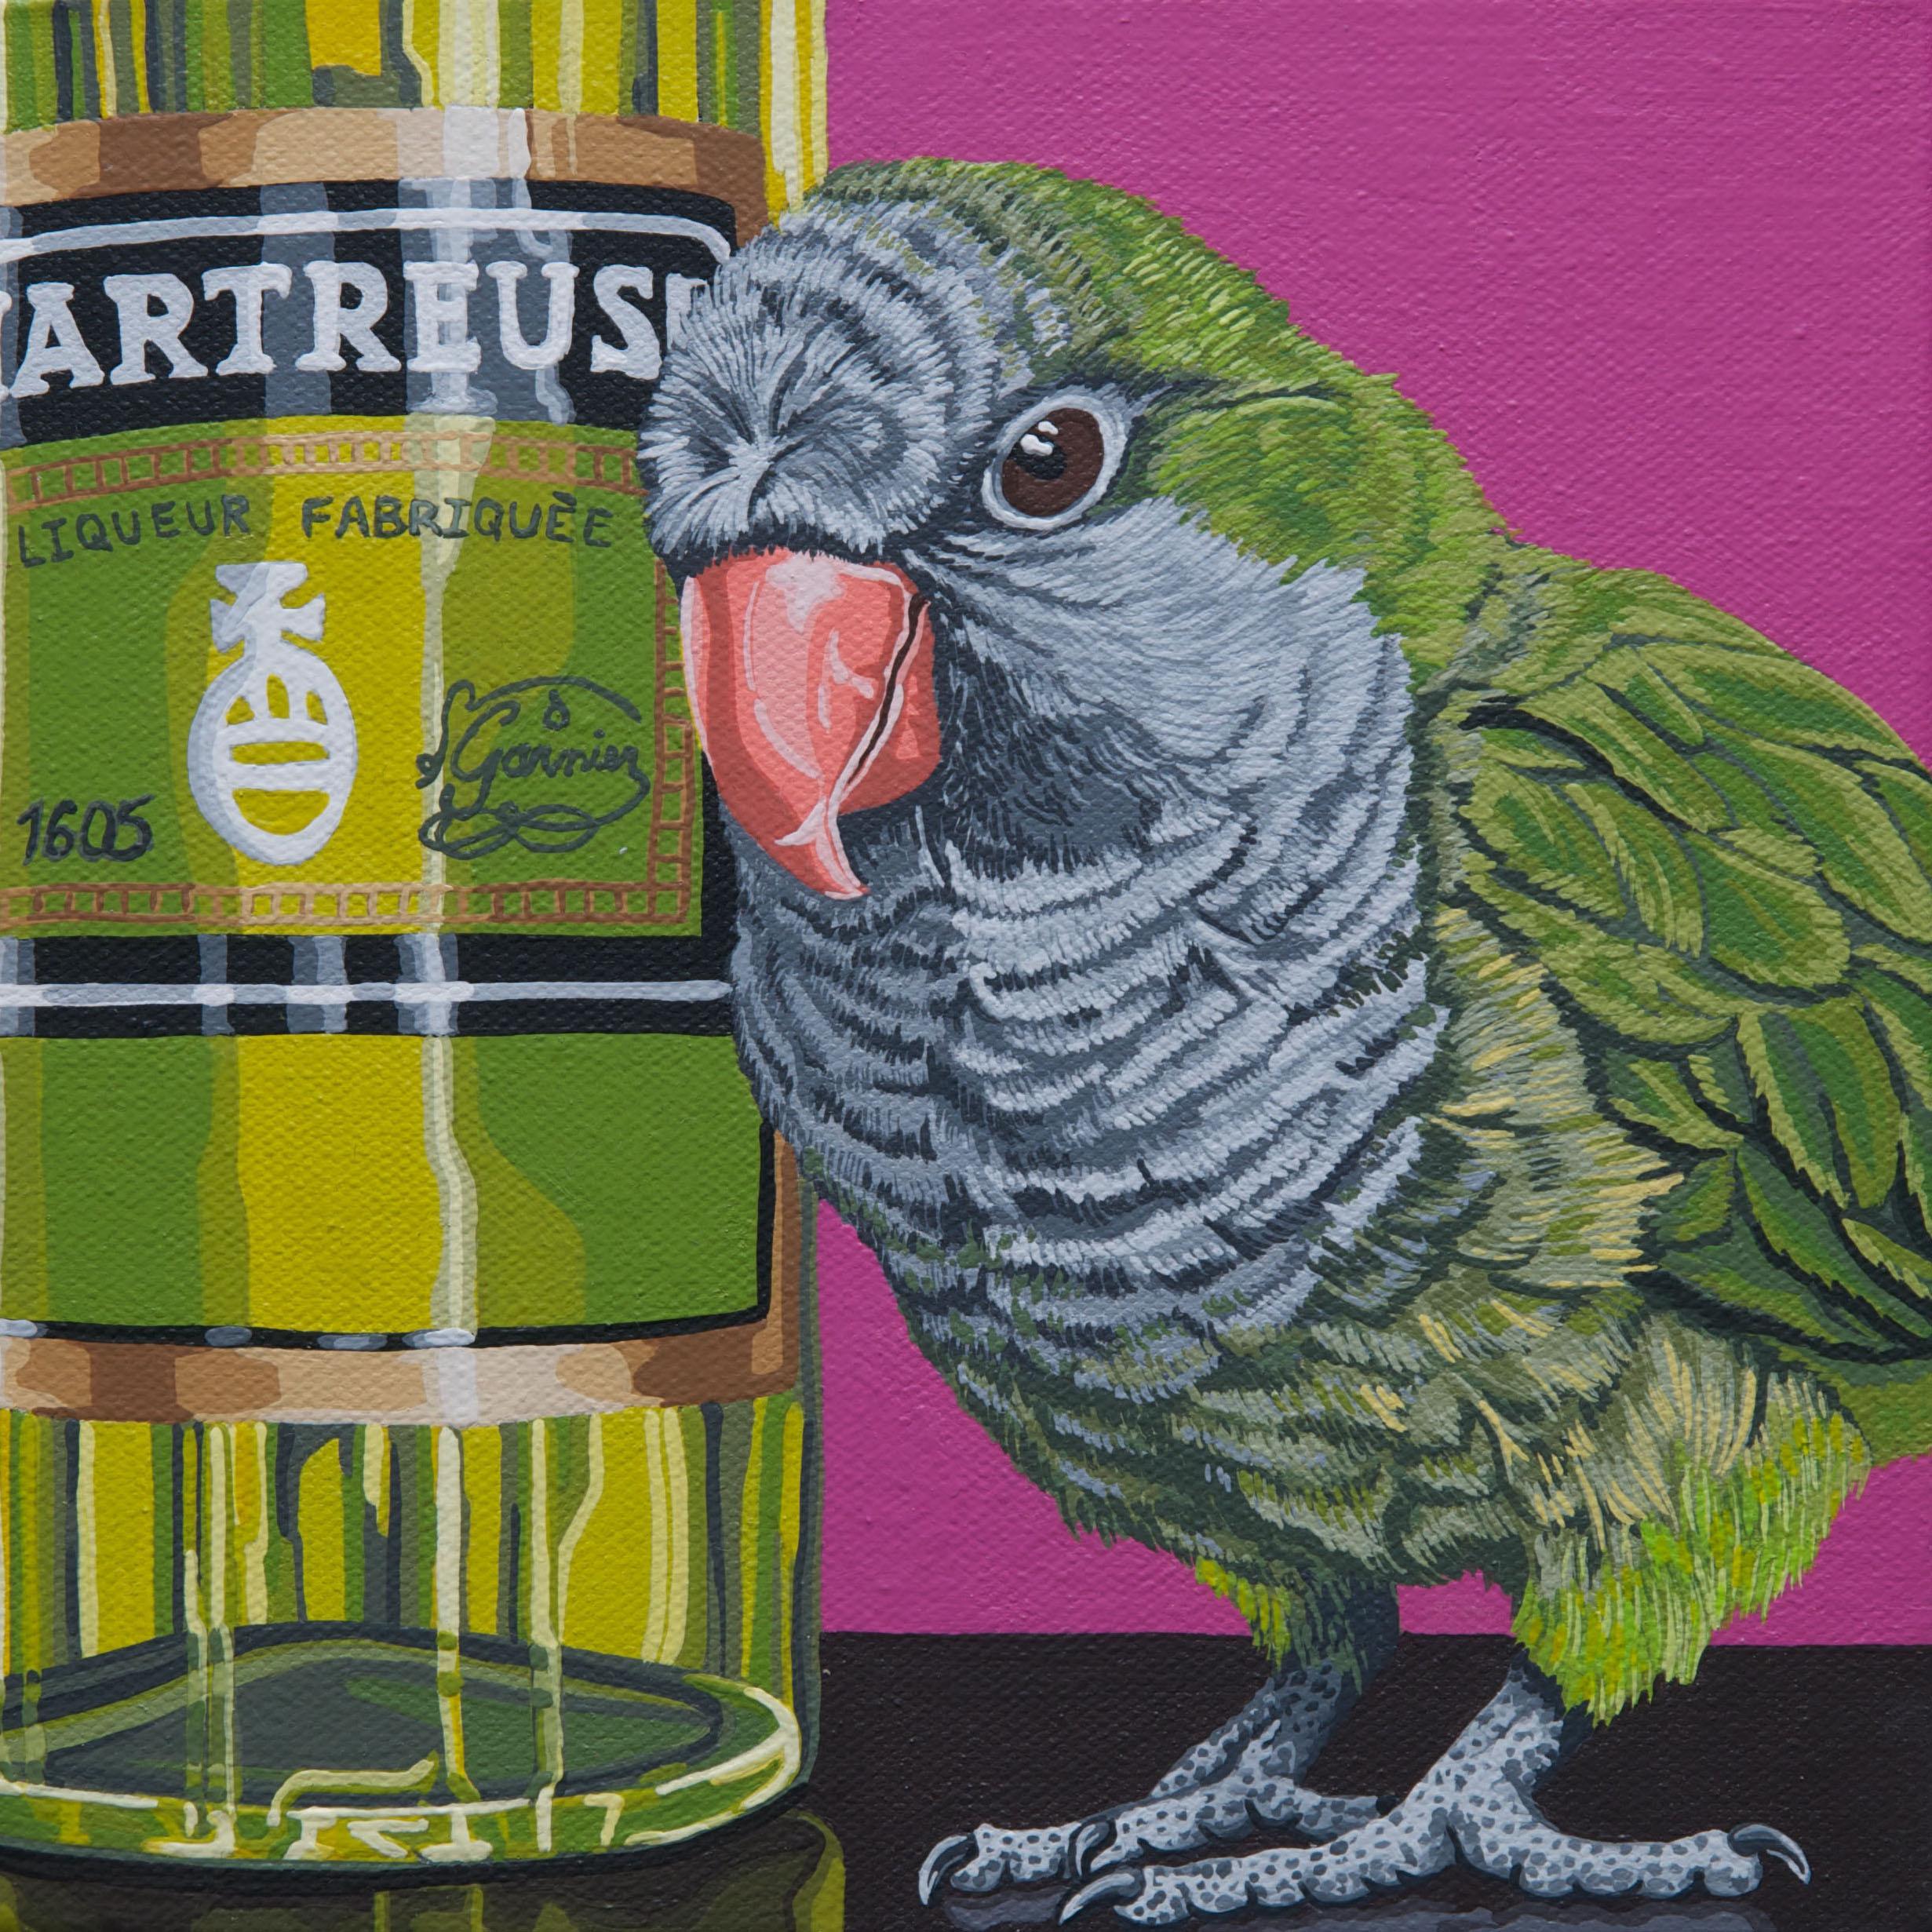 """Harry's Colorsake"", latex enamel on canvas, 10""x 10"", 2012-2013"